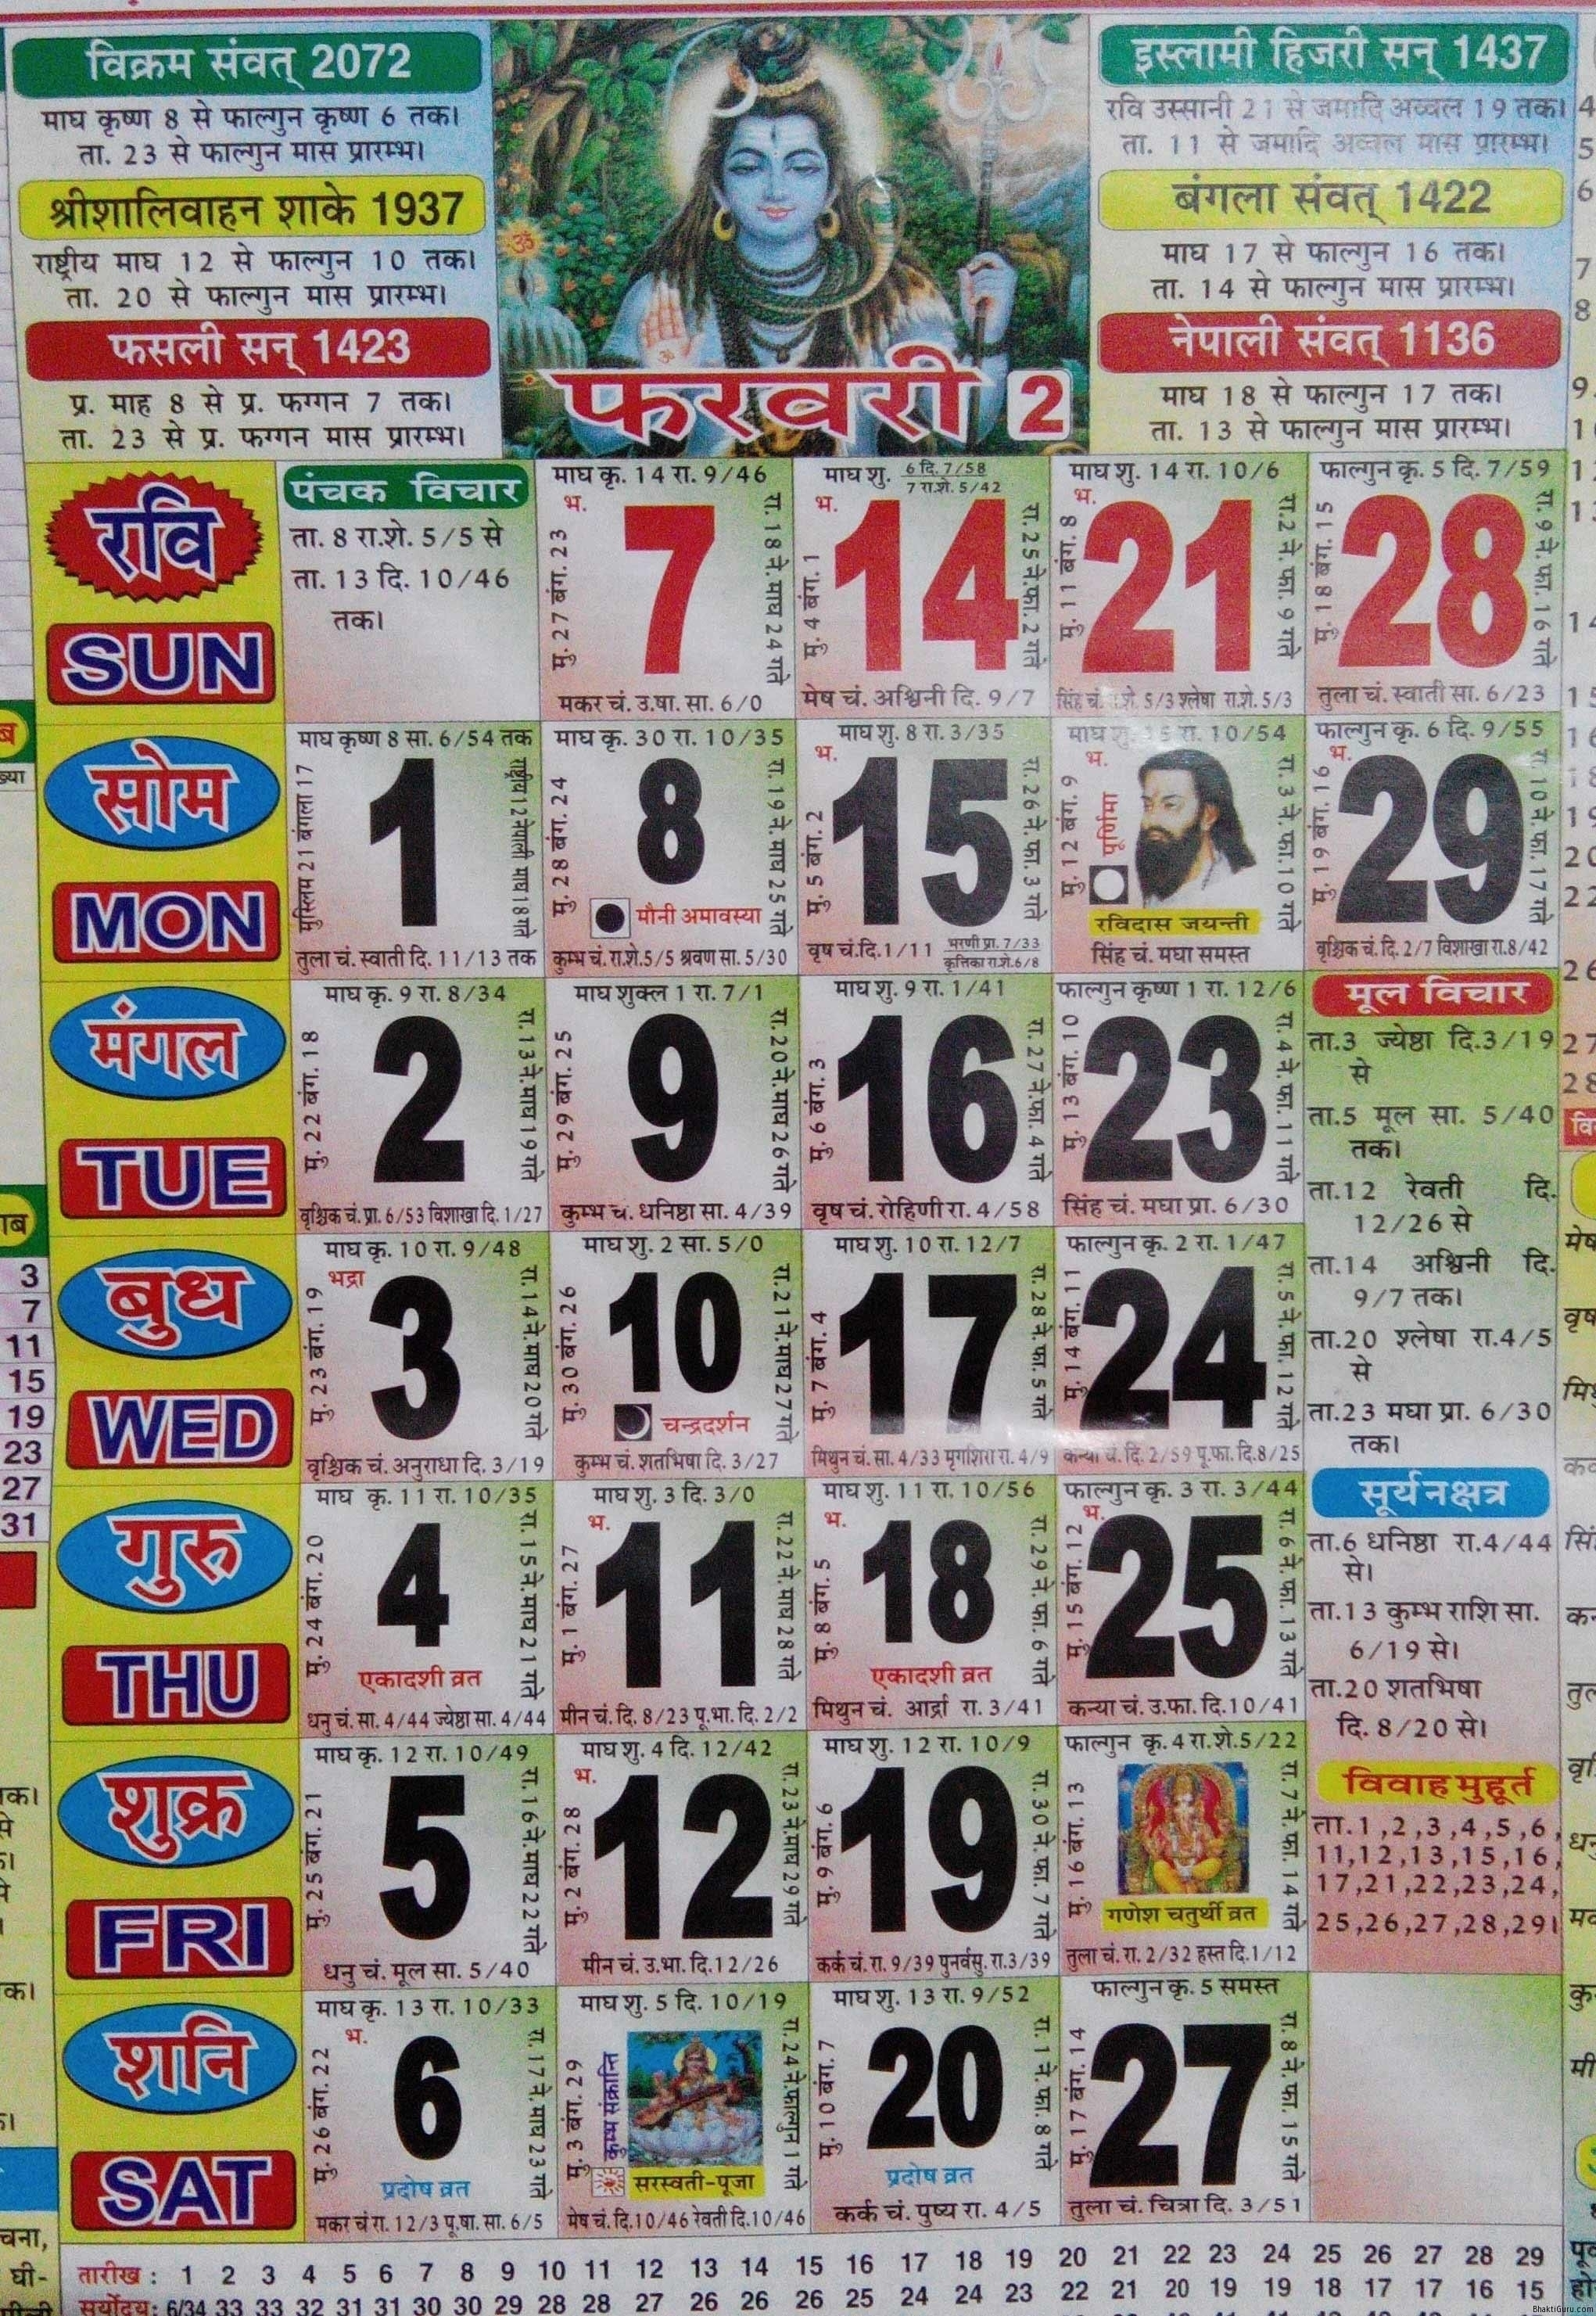 Hindu Calendar 2009 With Tithi   Template Calendar Printable regarding Hindu Calendar 2009 With Tithi